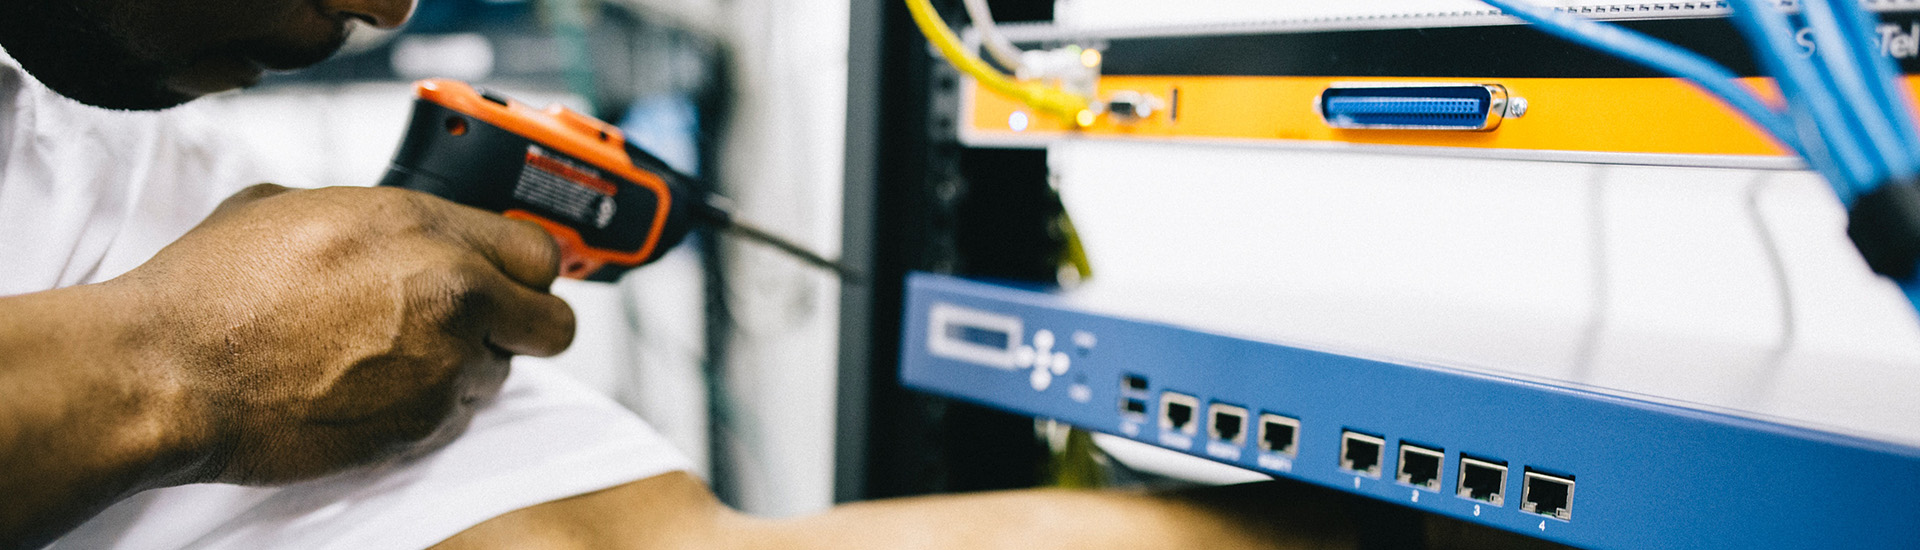 working-on-server-hardware